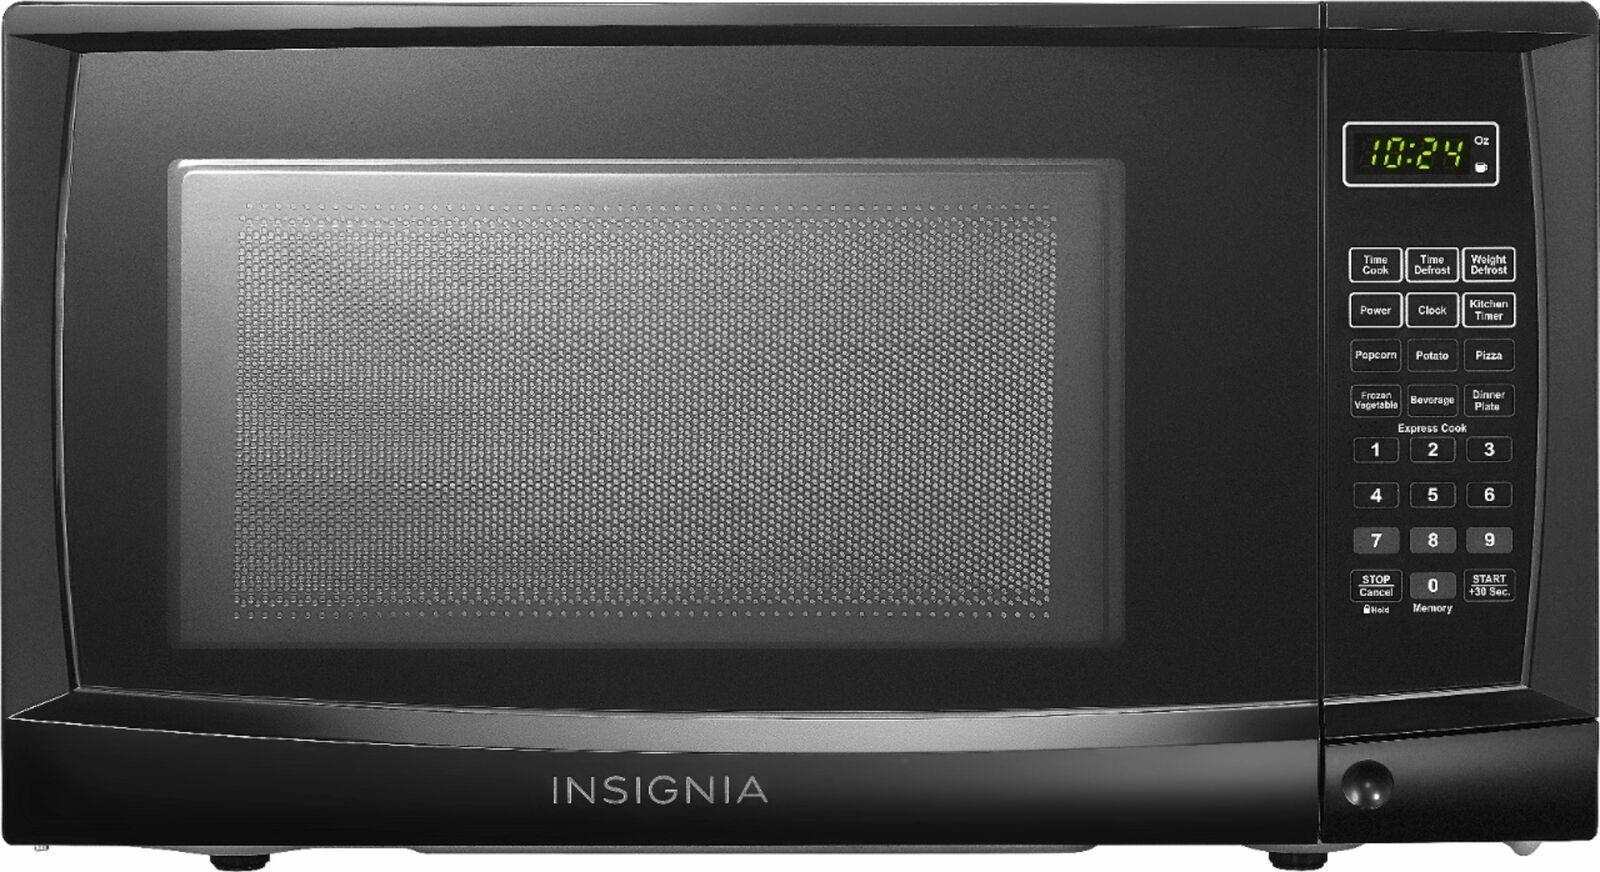 Insignia- 0.7 Cu. Ft. Compact Microwave - Black